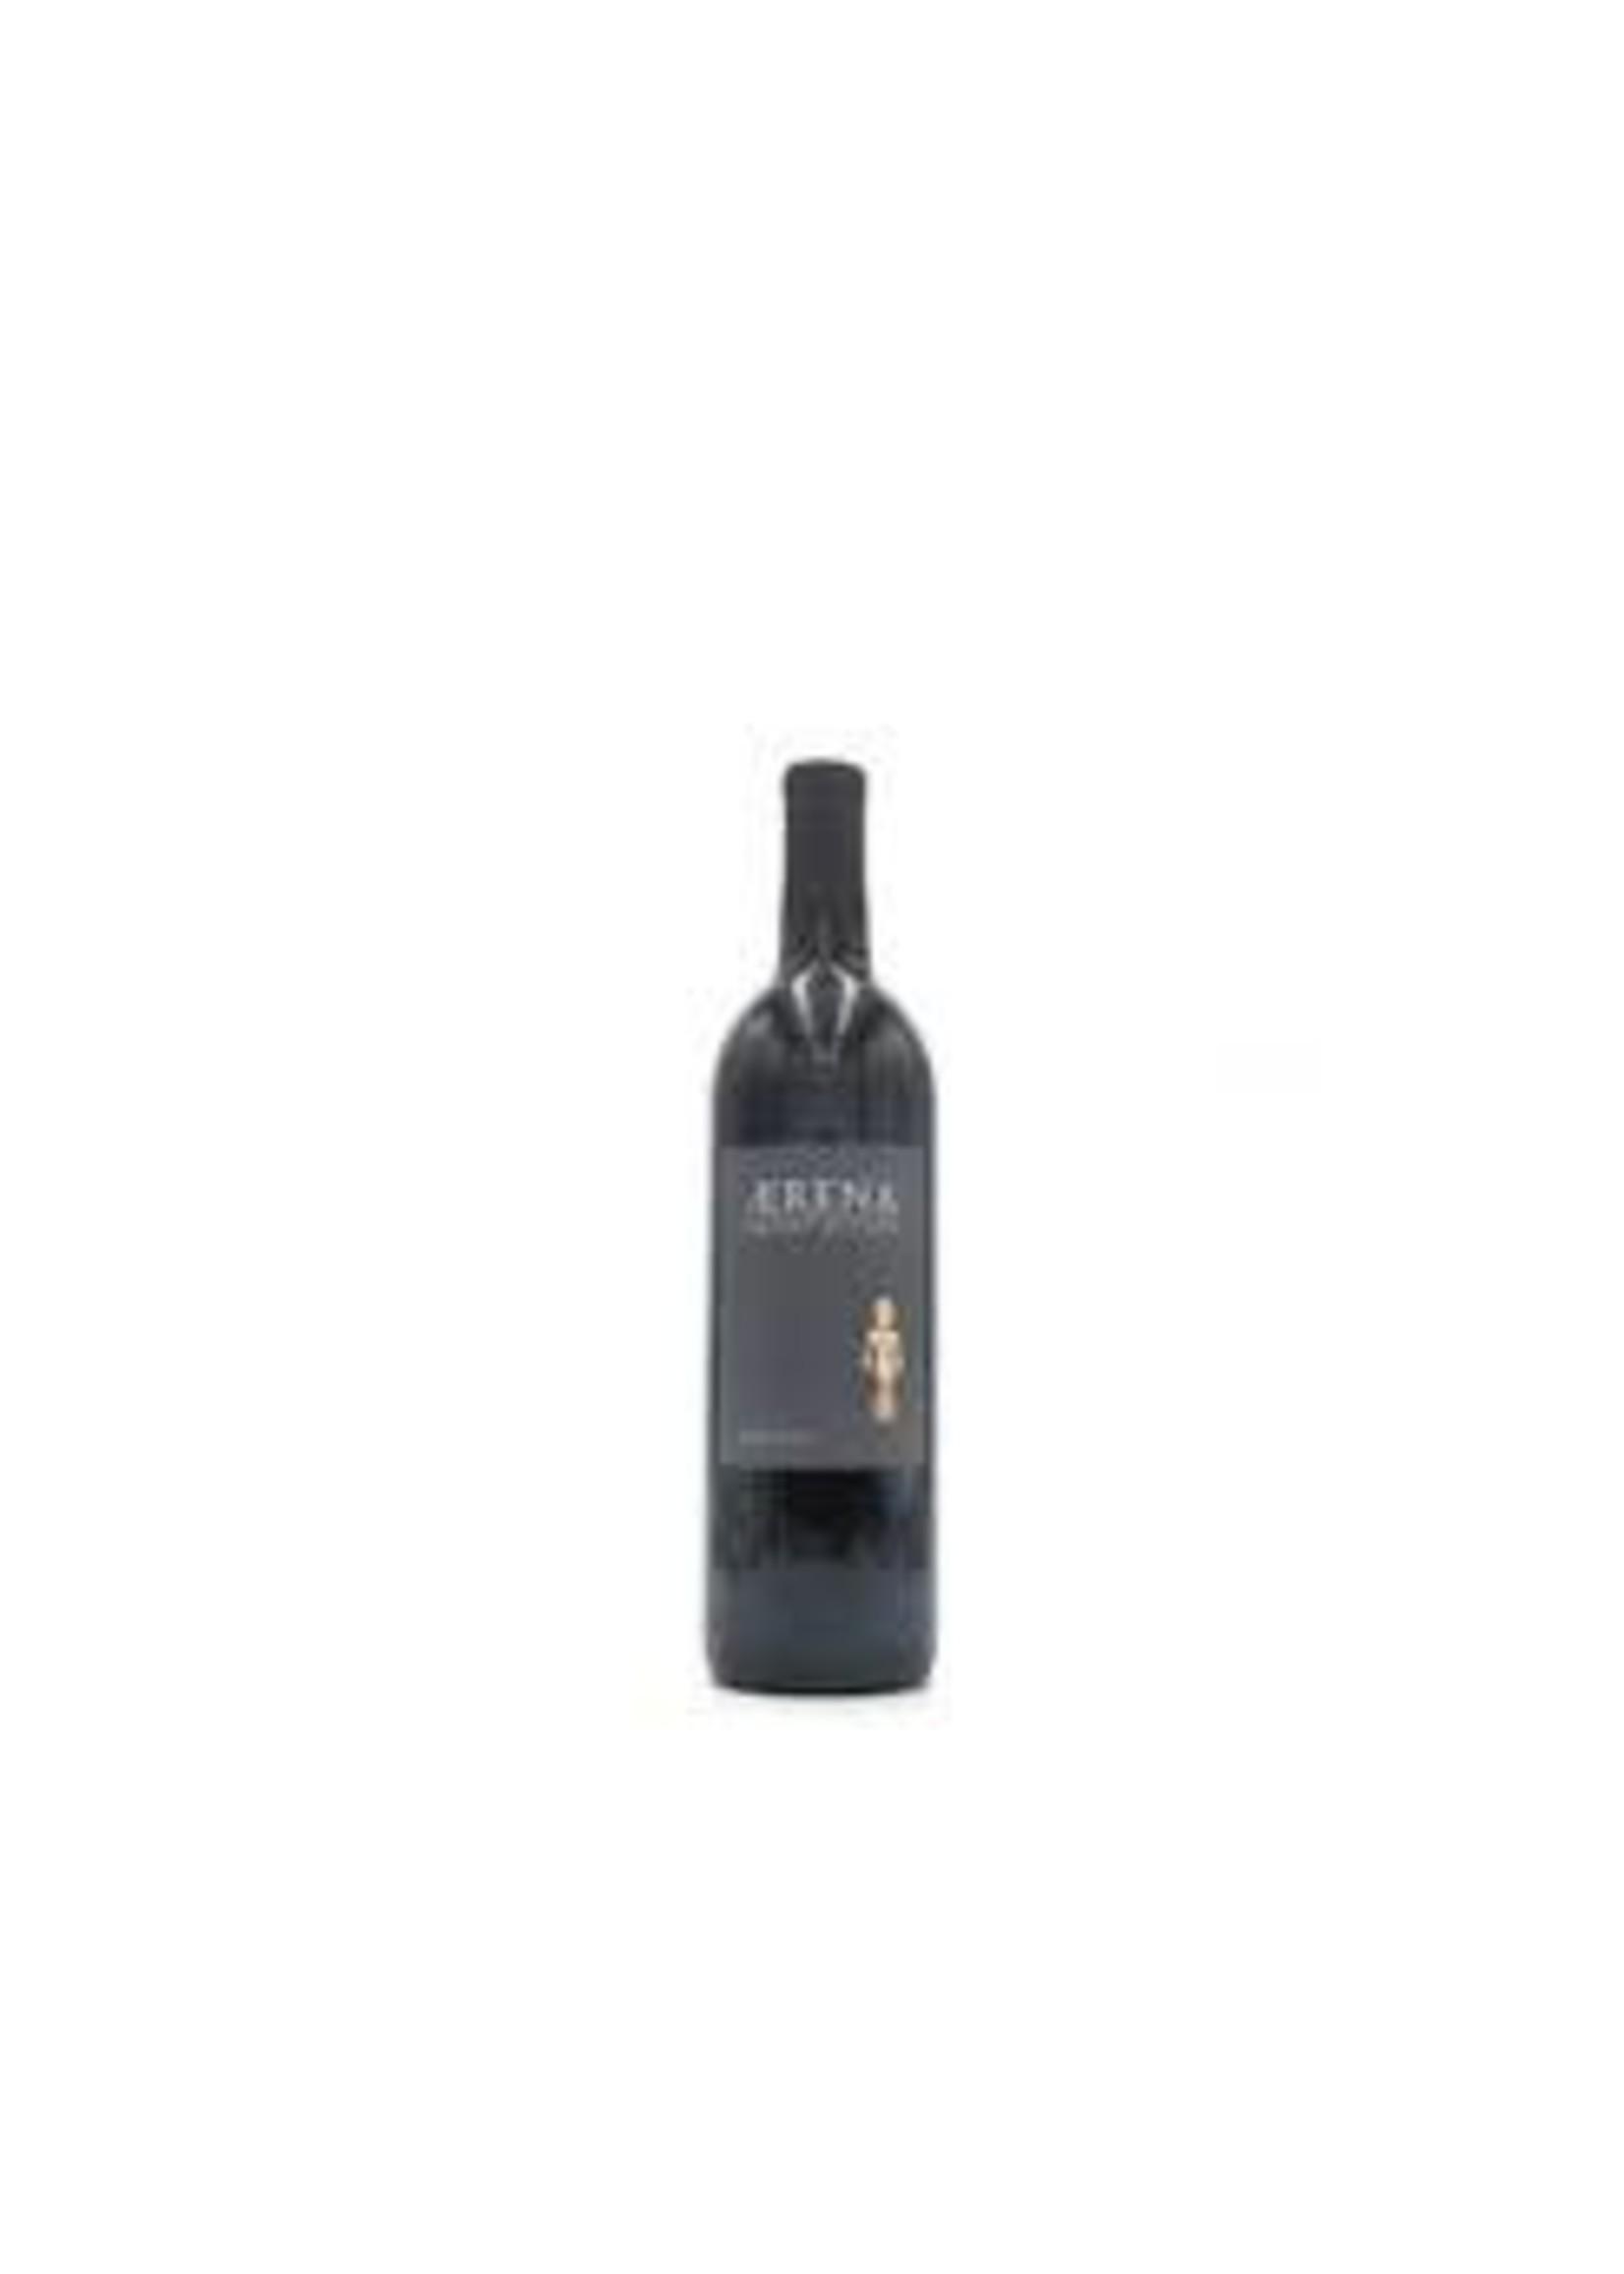 Aerena 2019 Cabernet Sauvignon 750ml